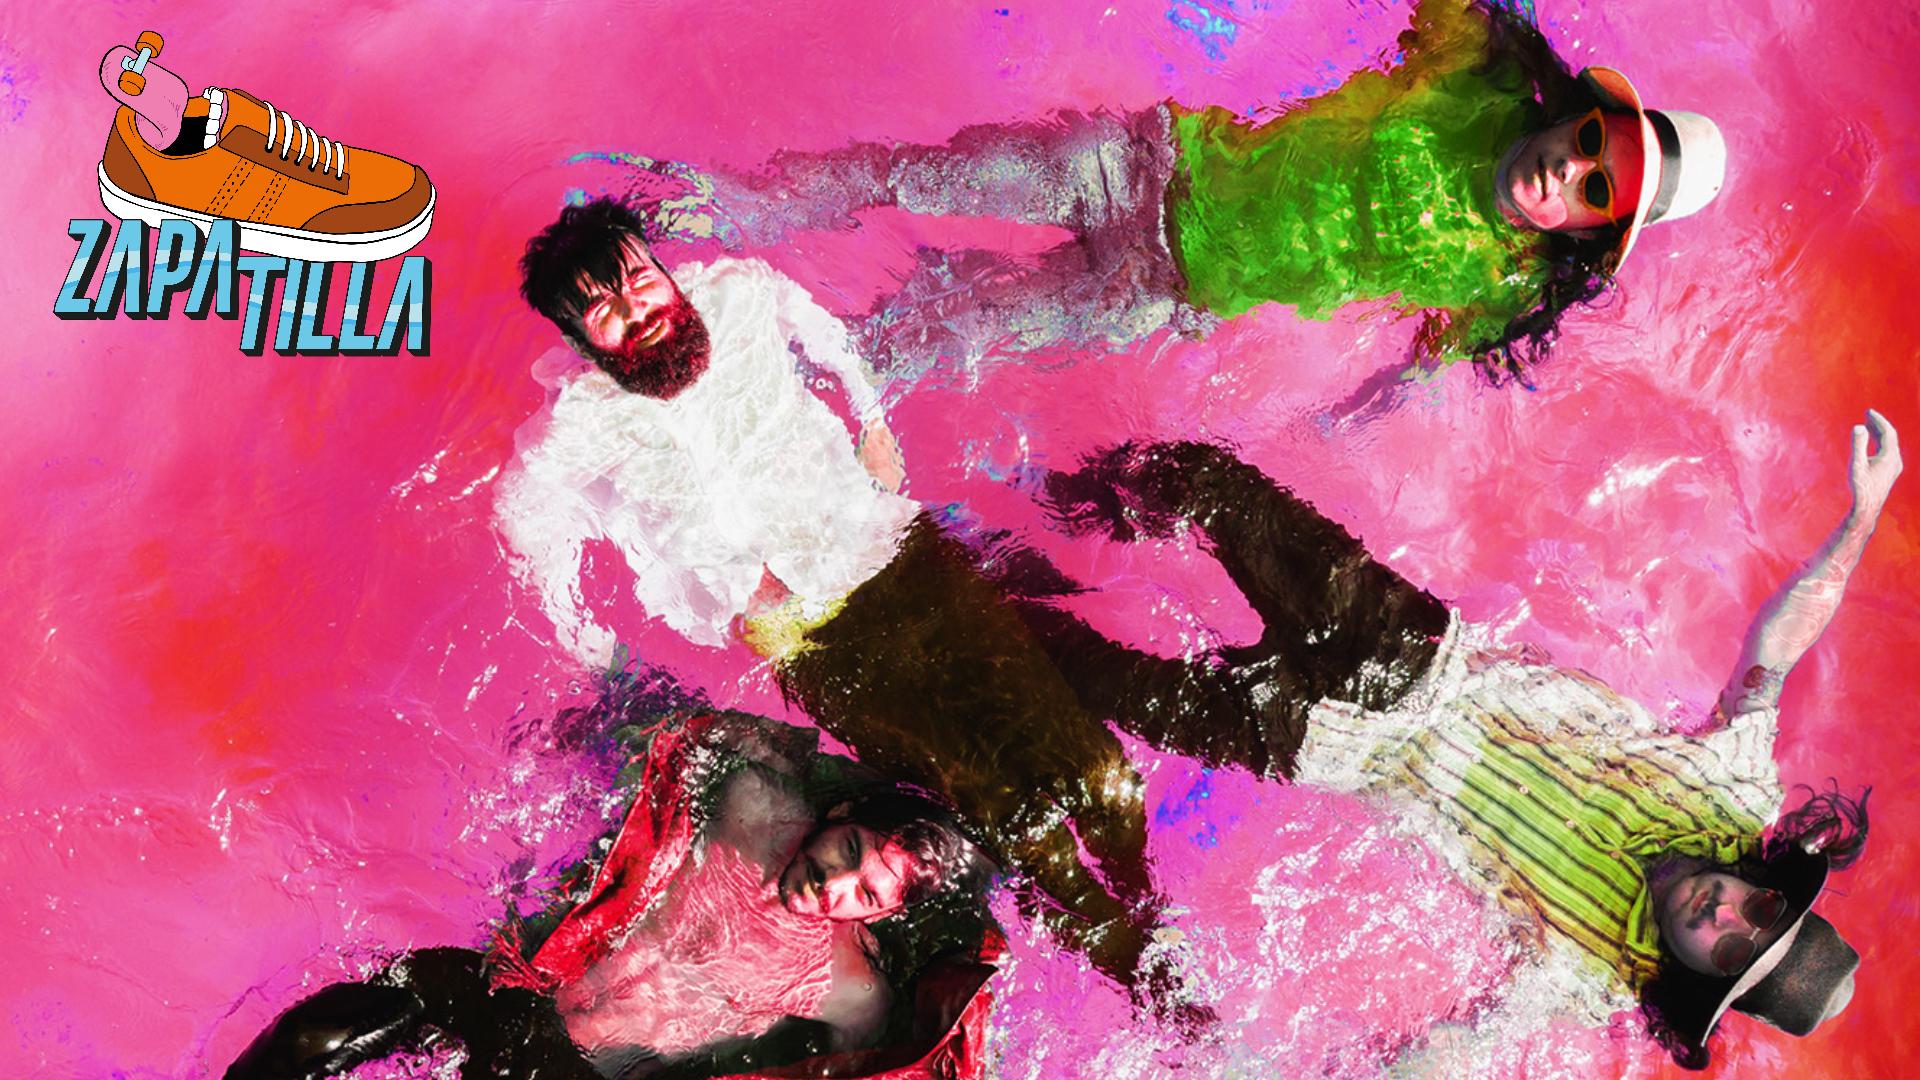 Zapatilla - Acid Mess